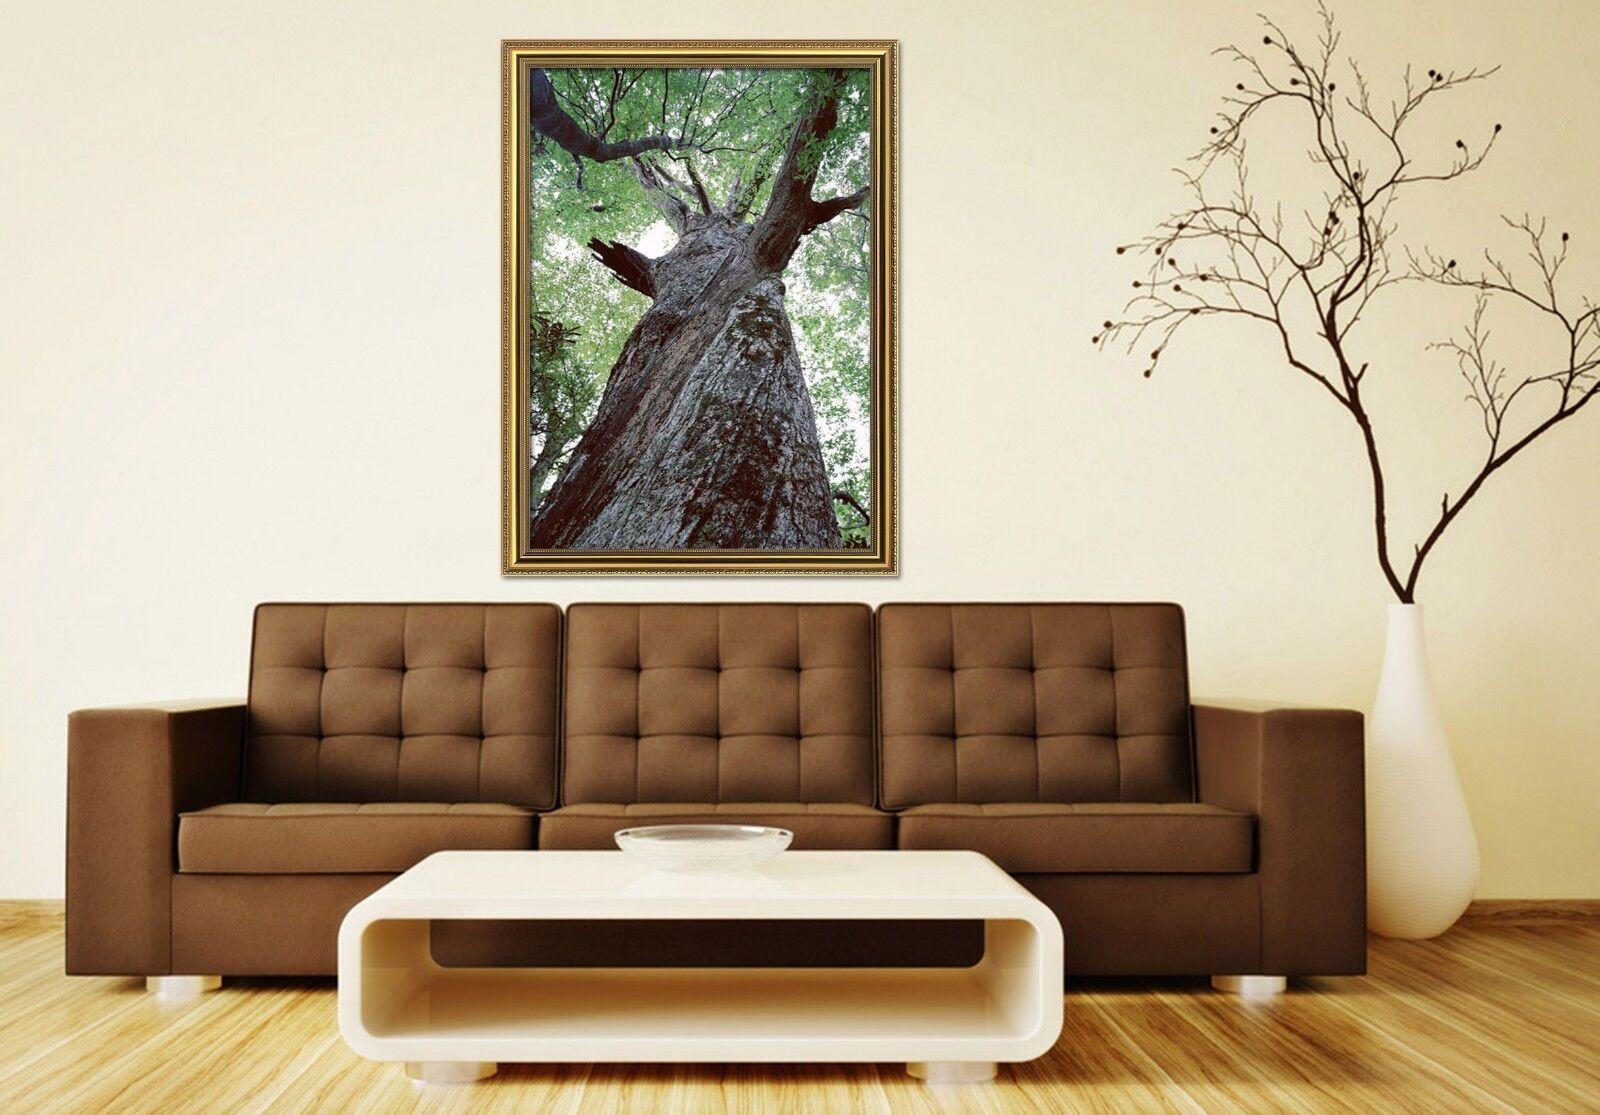 3D Big Tree 6 Framed Poster Home Decor Print Painting Art AJ AU